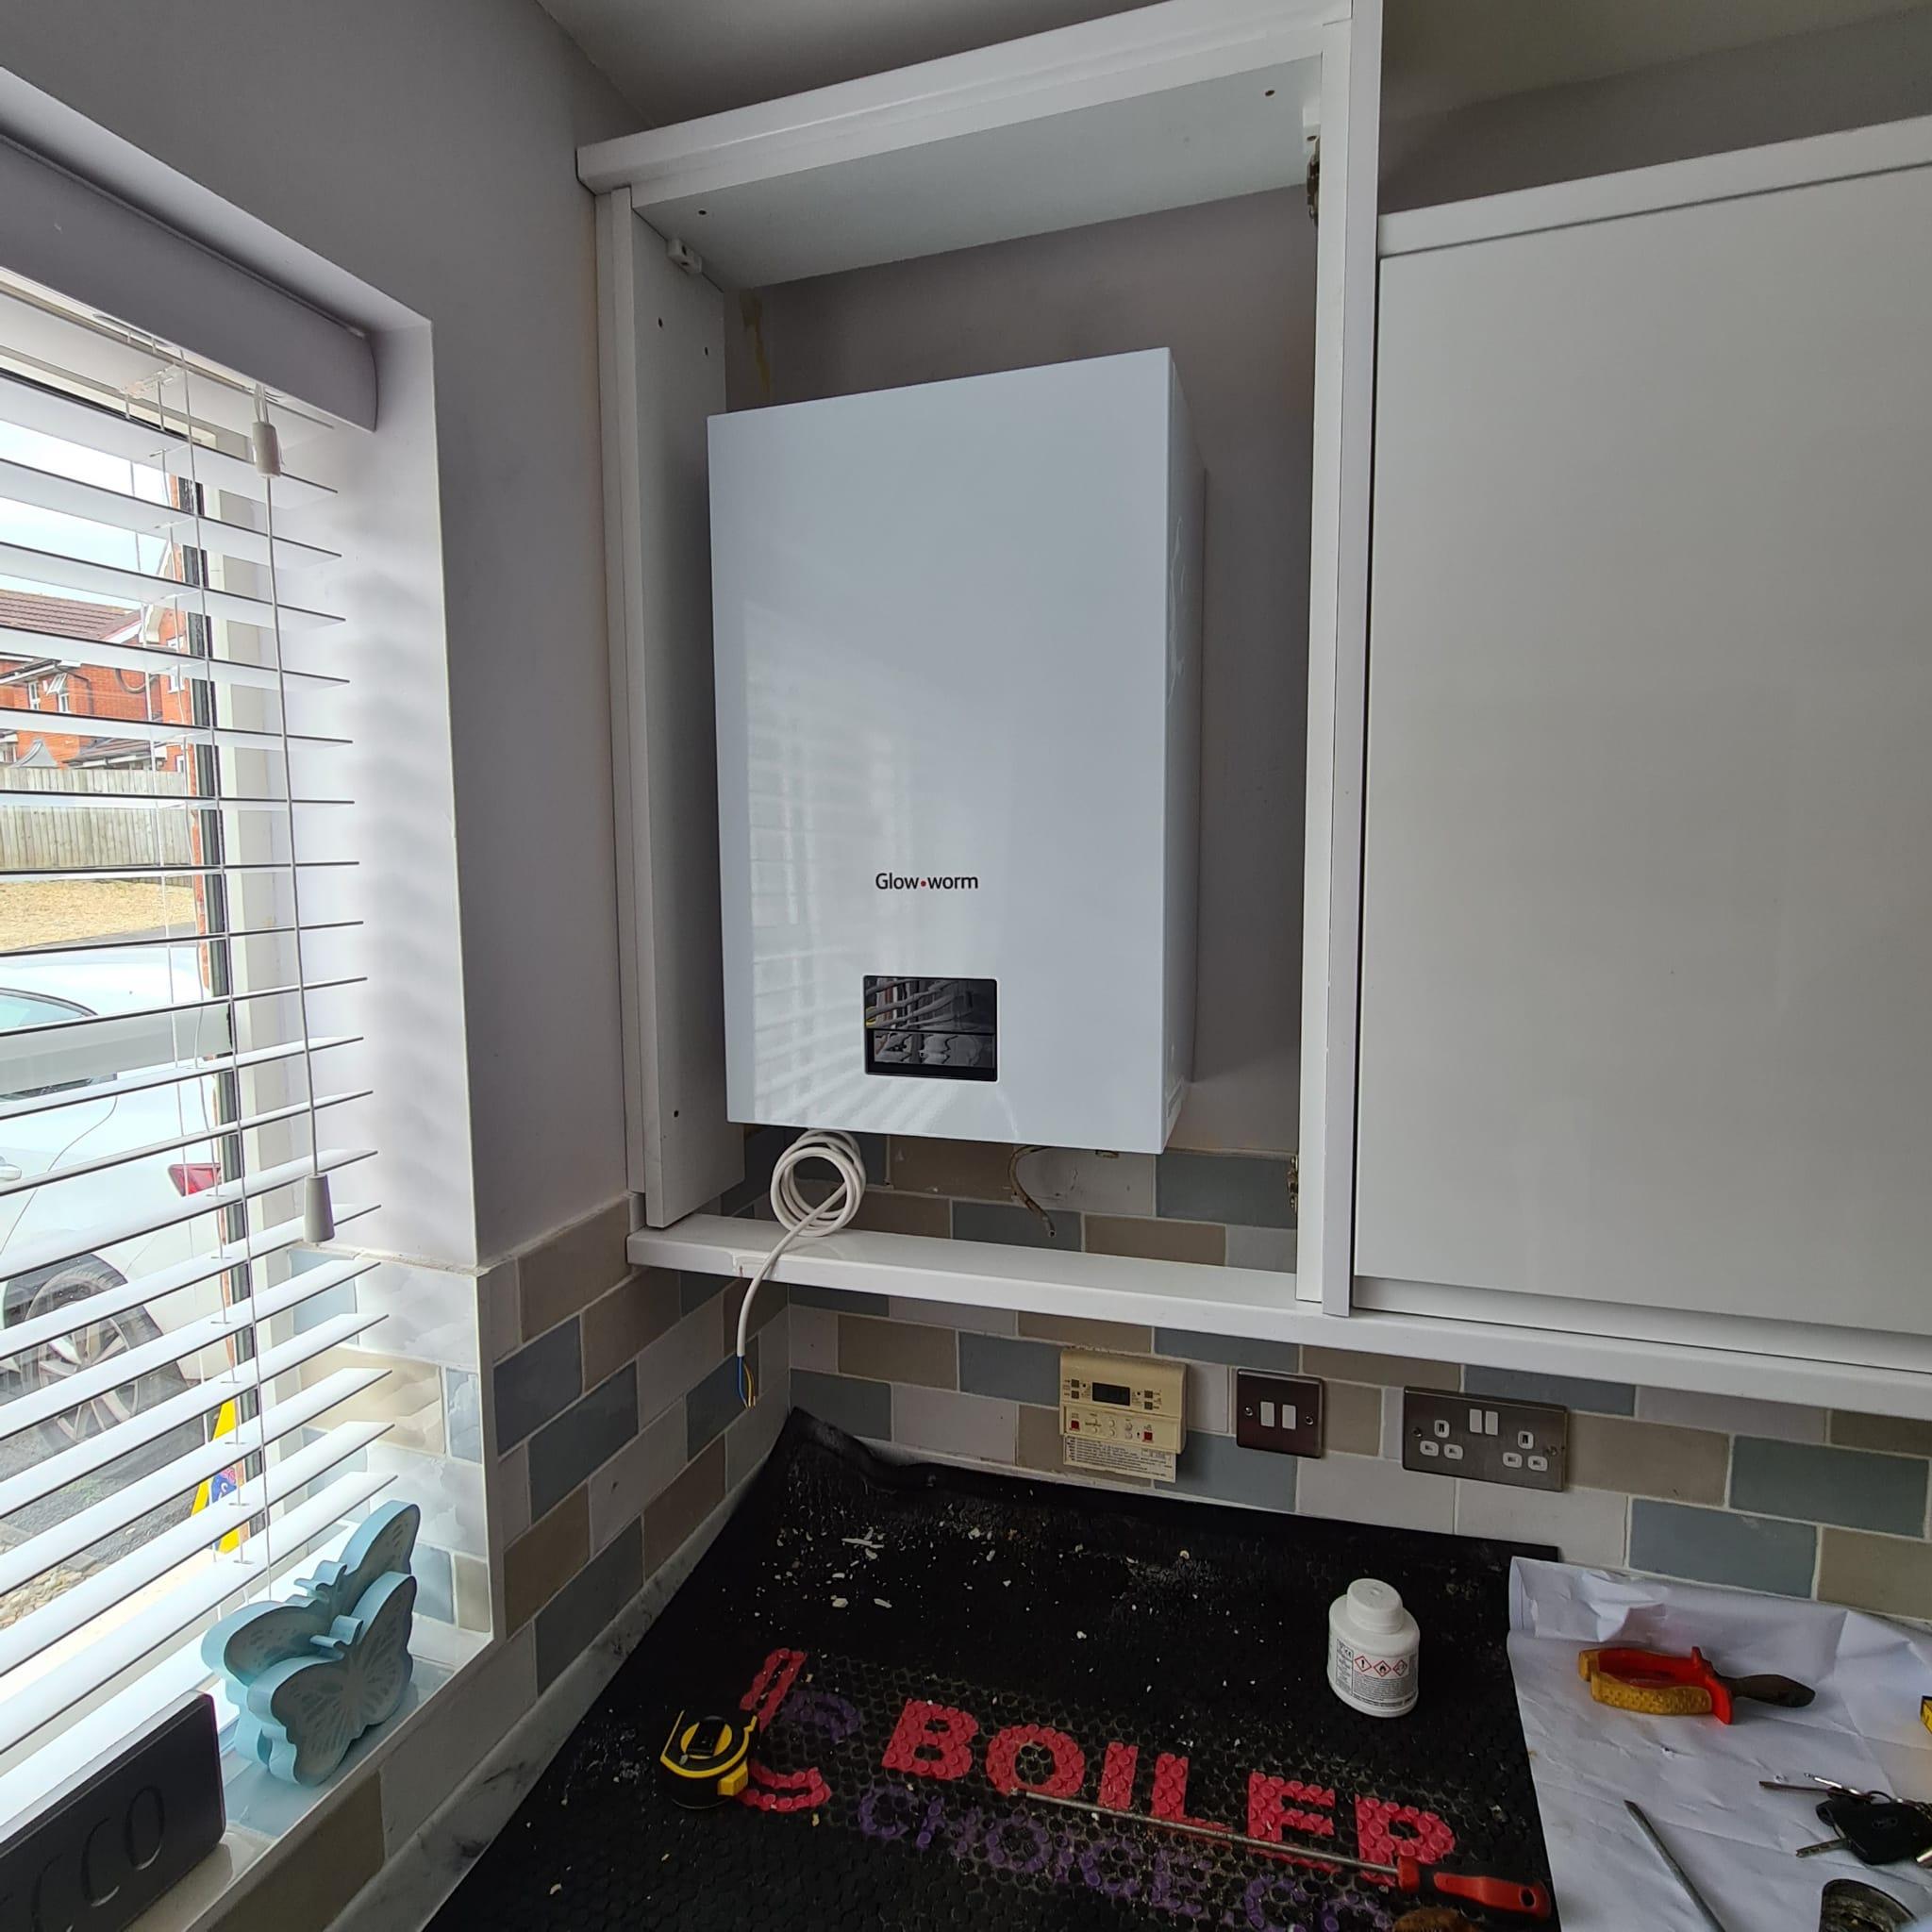 New boiler in birmingham